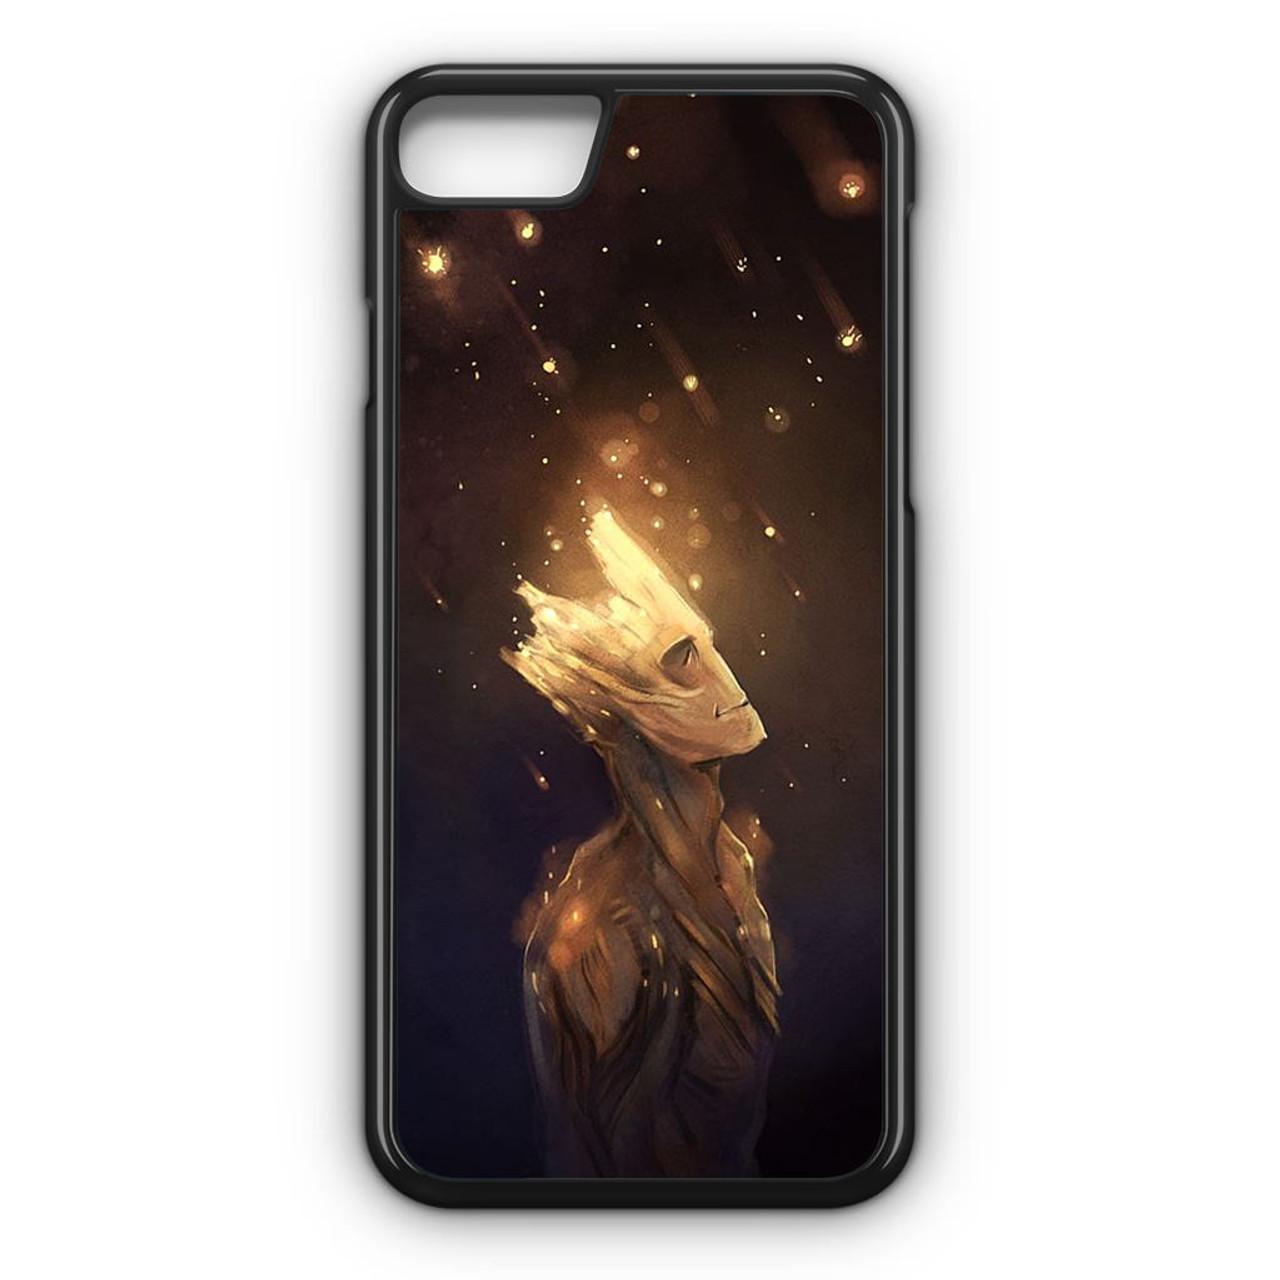 iphone 8 groot case